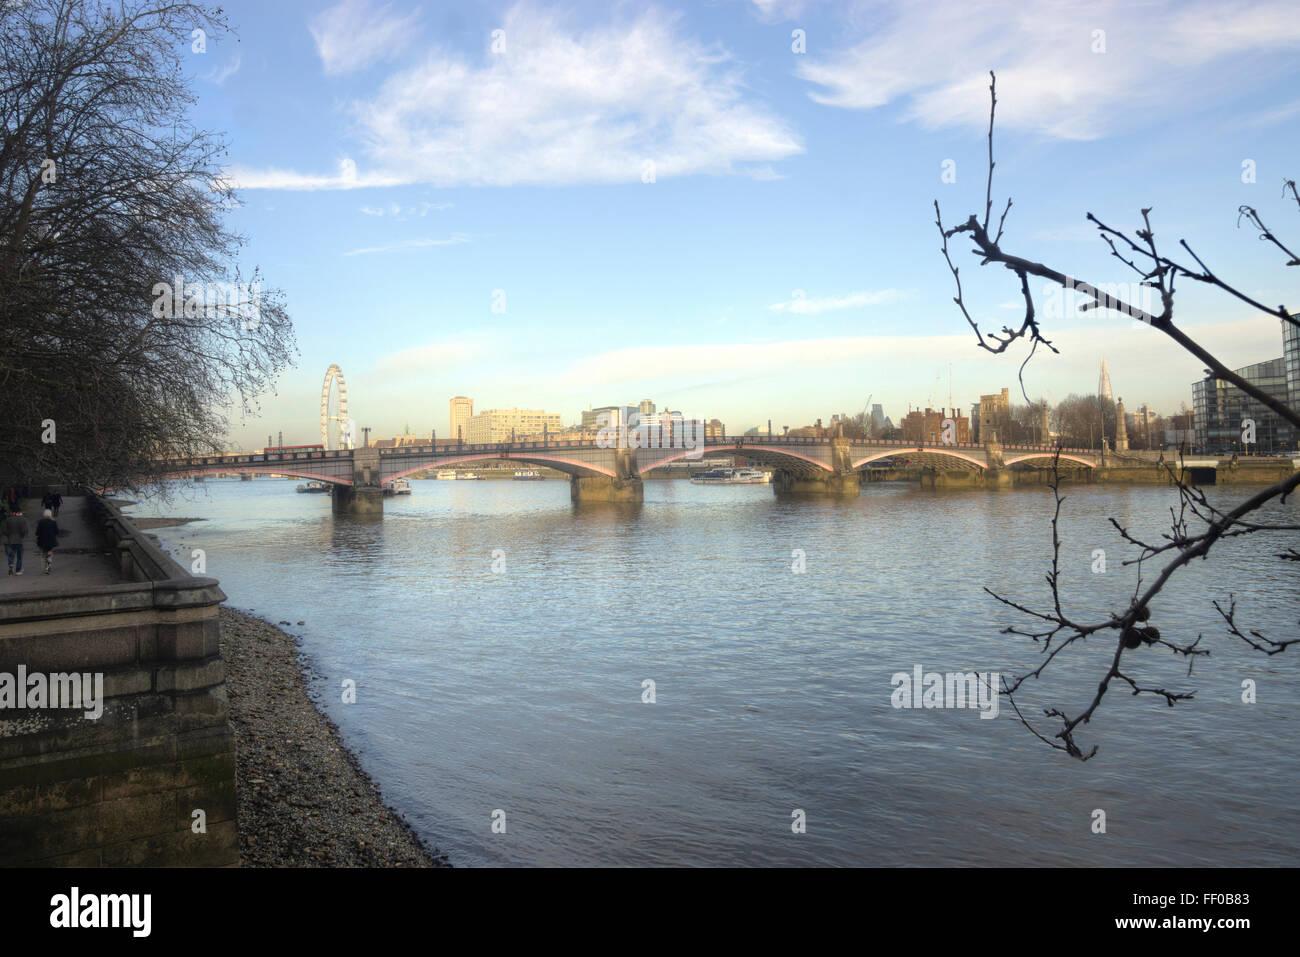 Lambeth Bridge,  River Thames - Stock Image